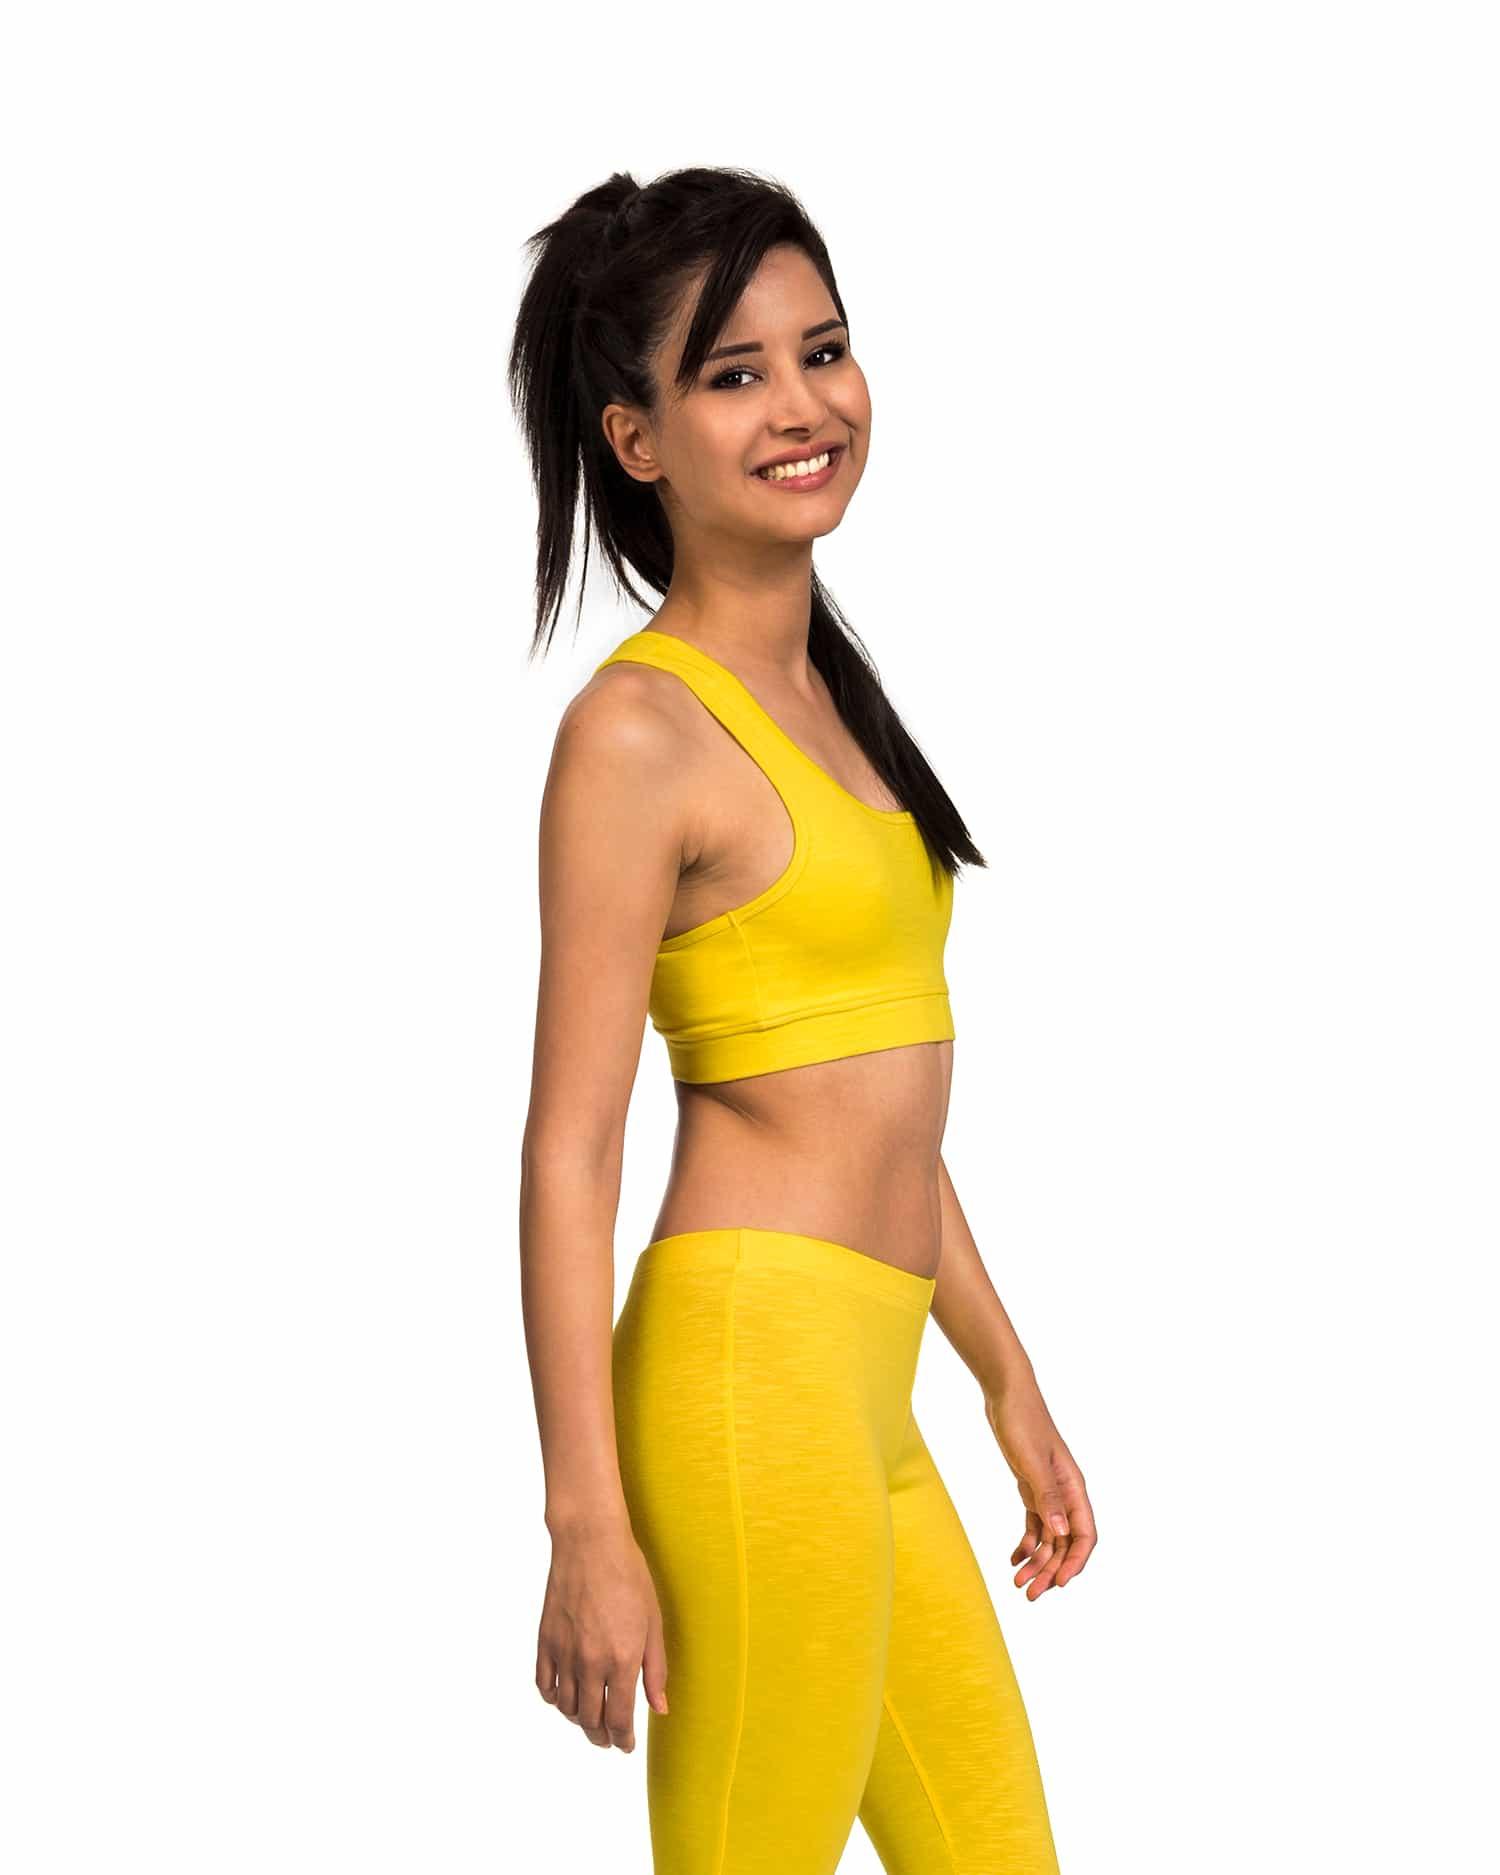 b-light-organic-cotton-leggings-sports-bra-saral-adha-yellow-1